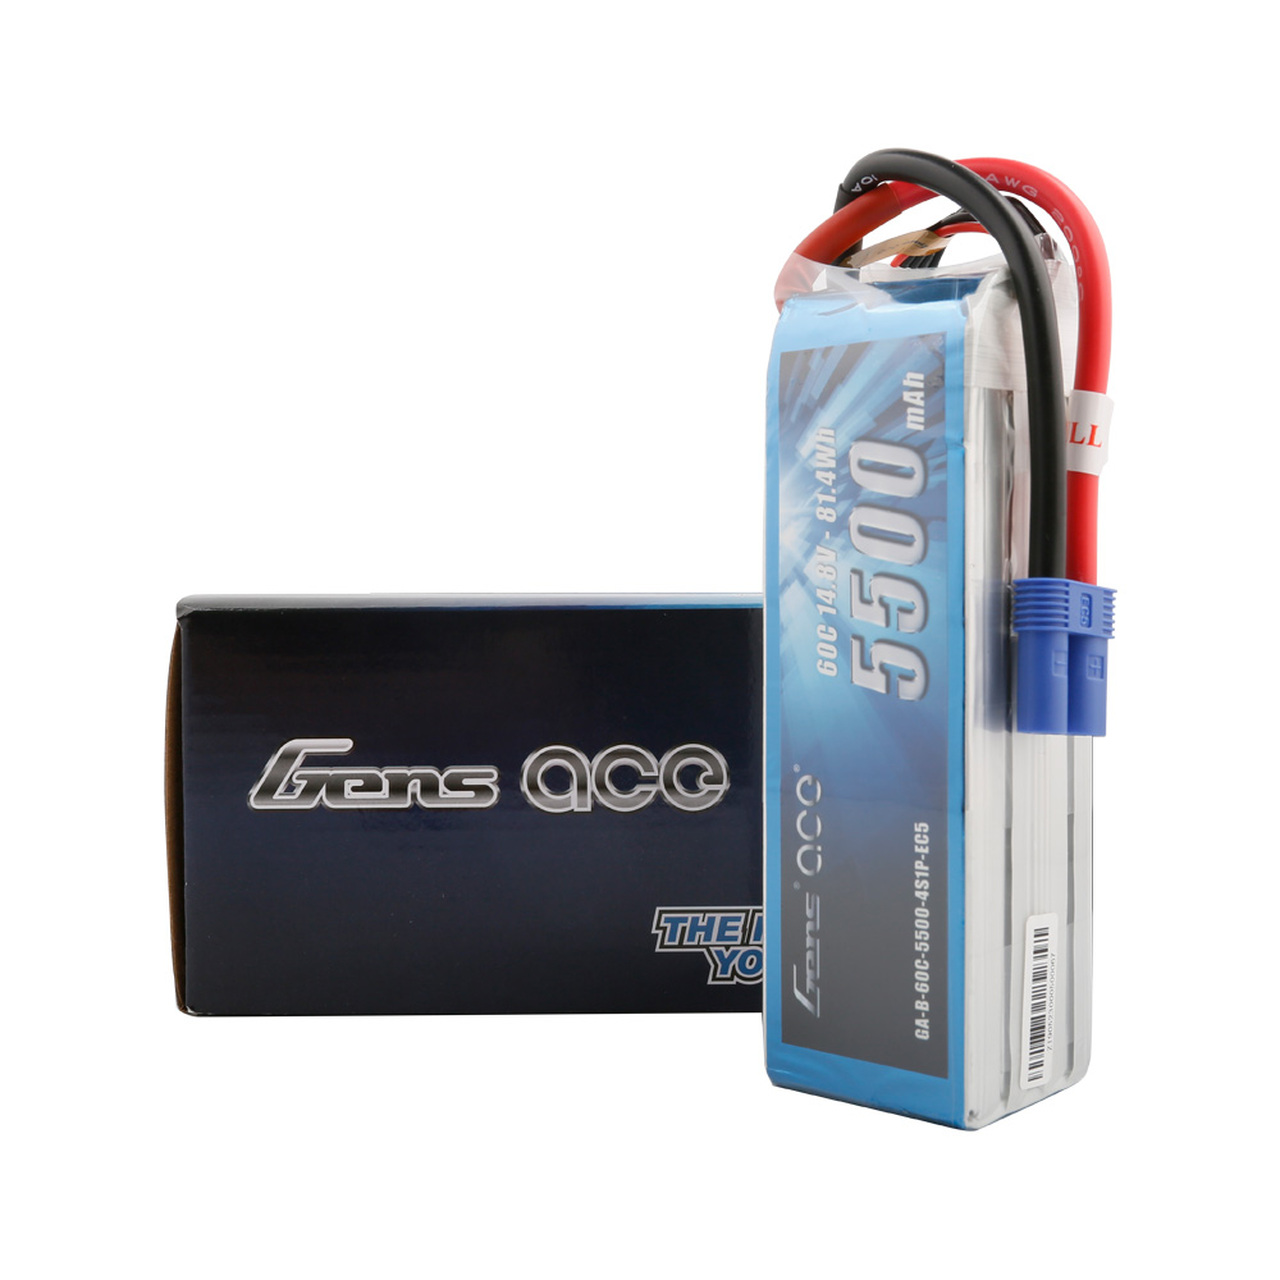 Gens ace 5500mAh 14.8V 60C 4S1P Lipo Battery Pack with EC5 Plug